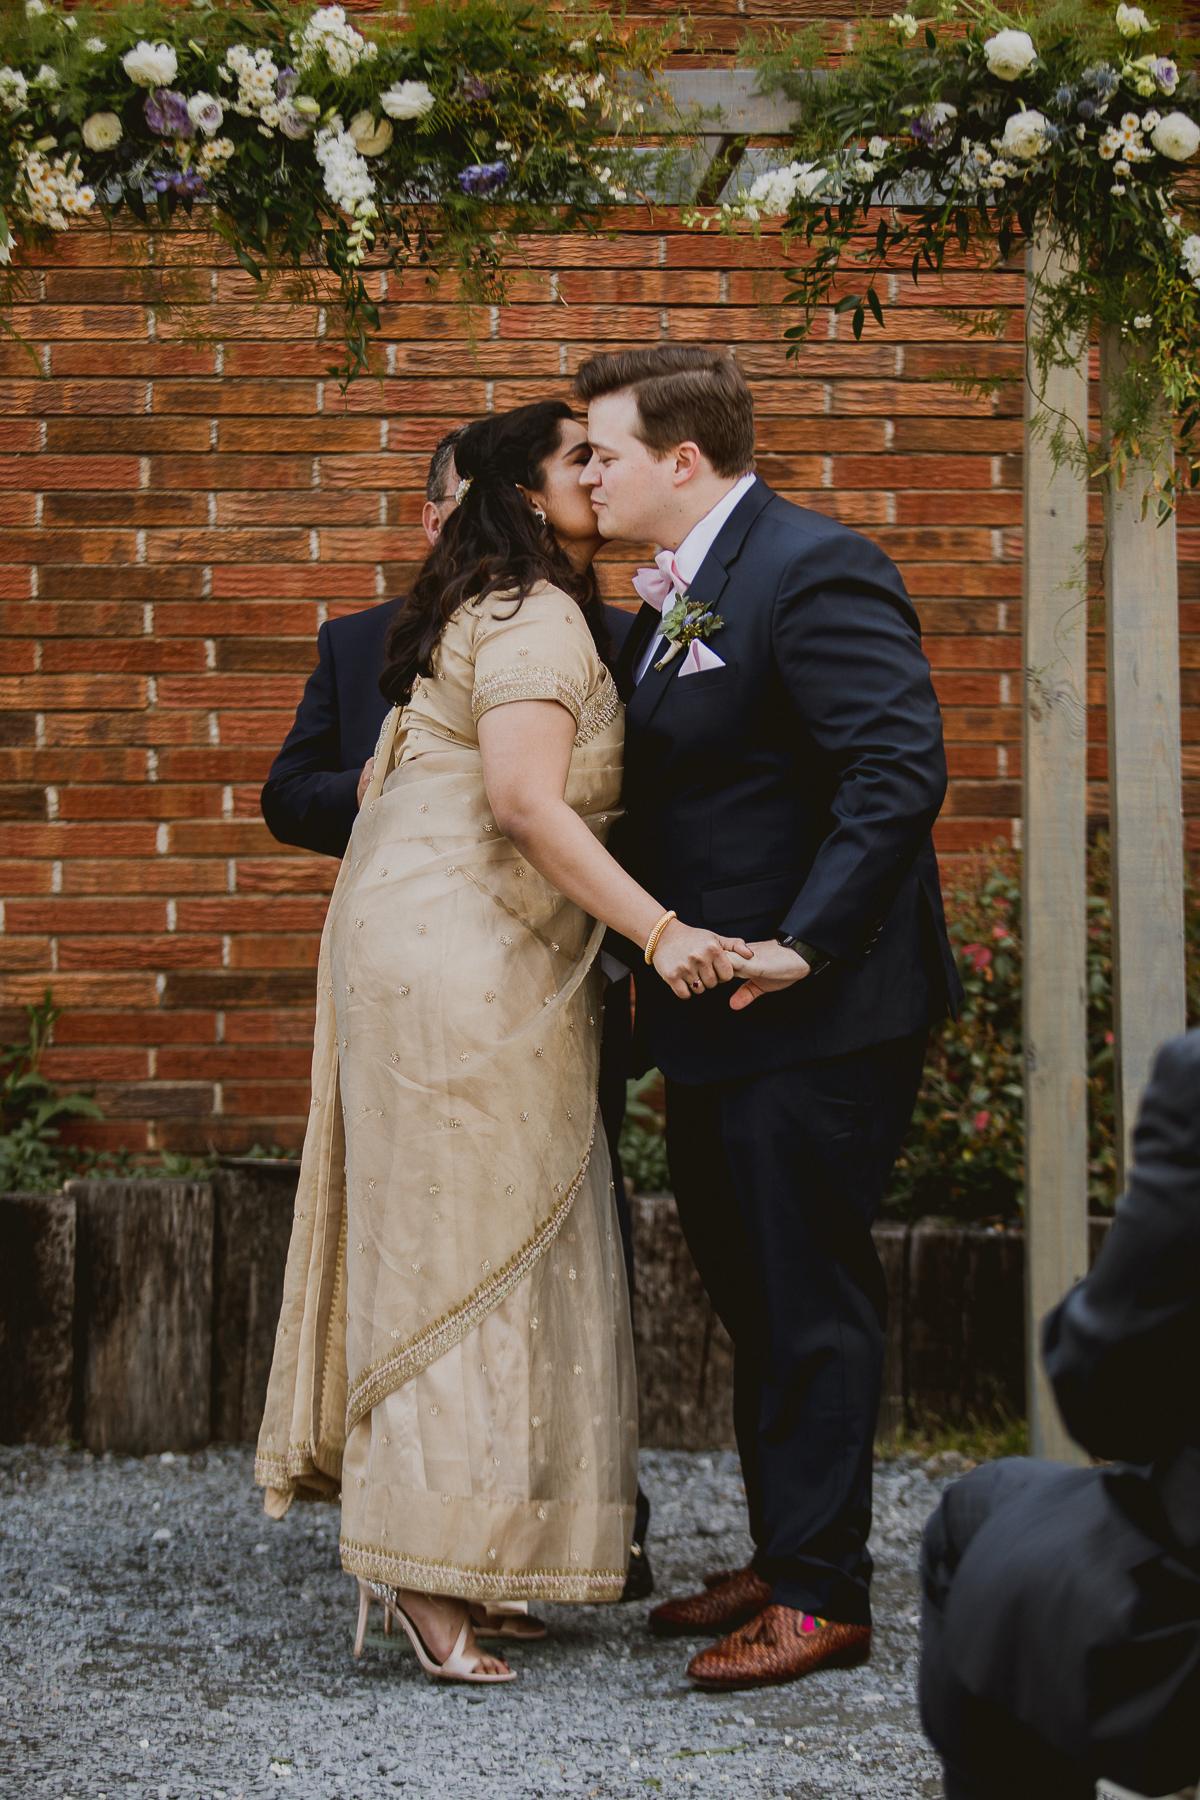 eventide-brewery-indian-american-fusion-kelley-raye-atlanta-los-angeles-wedding-photographer-72.jpg